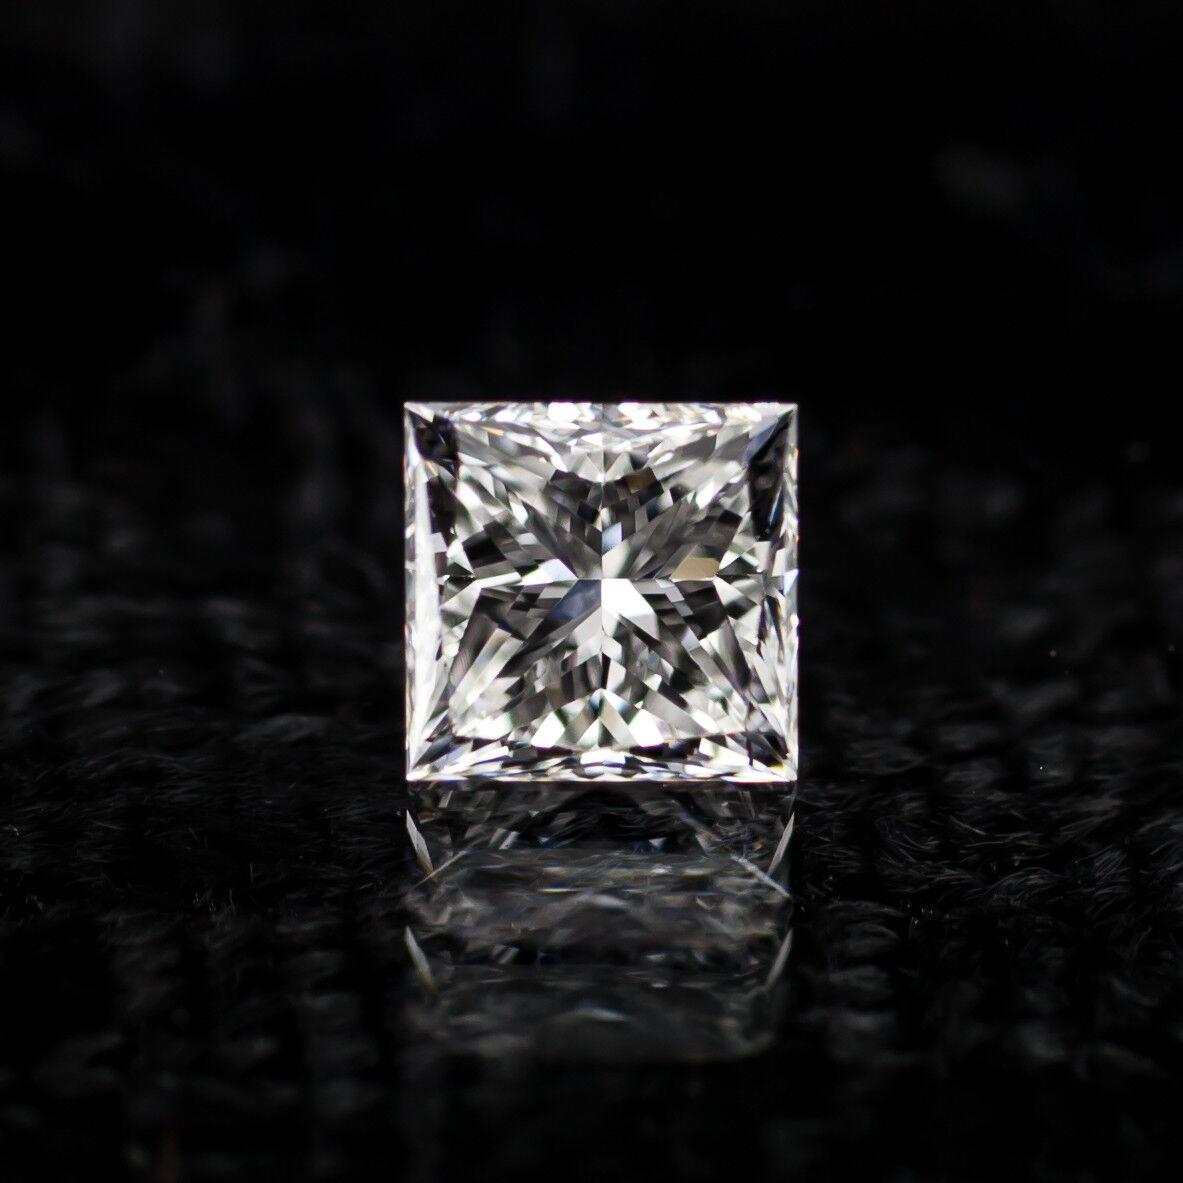 0.76 Carat Loose E / VS1 Princess Cut Diamond GIA Certified